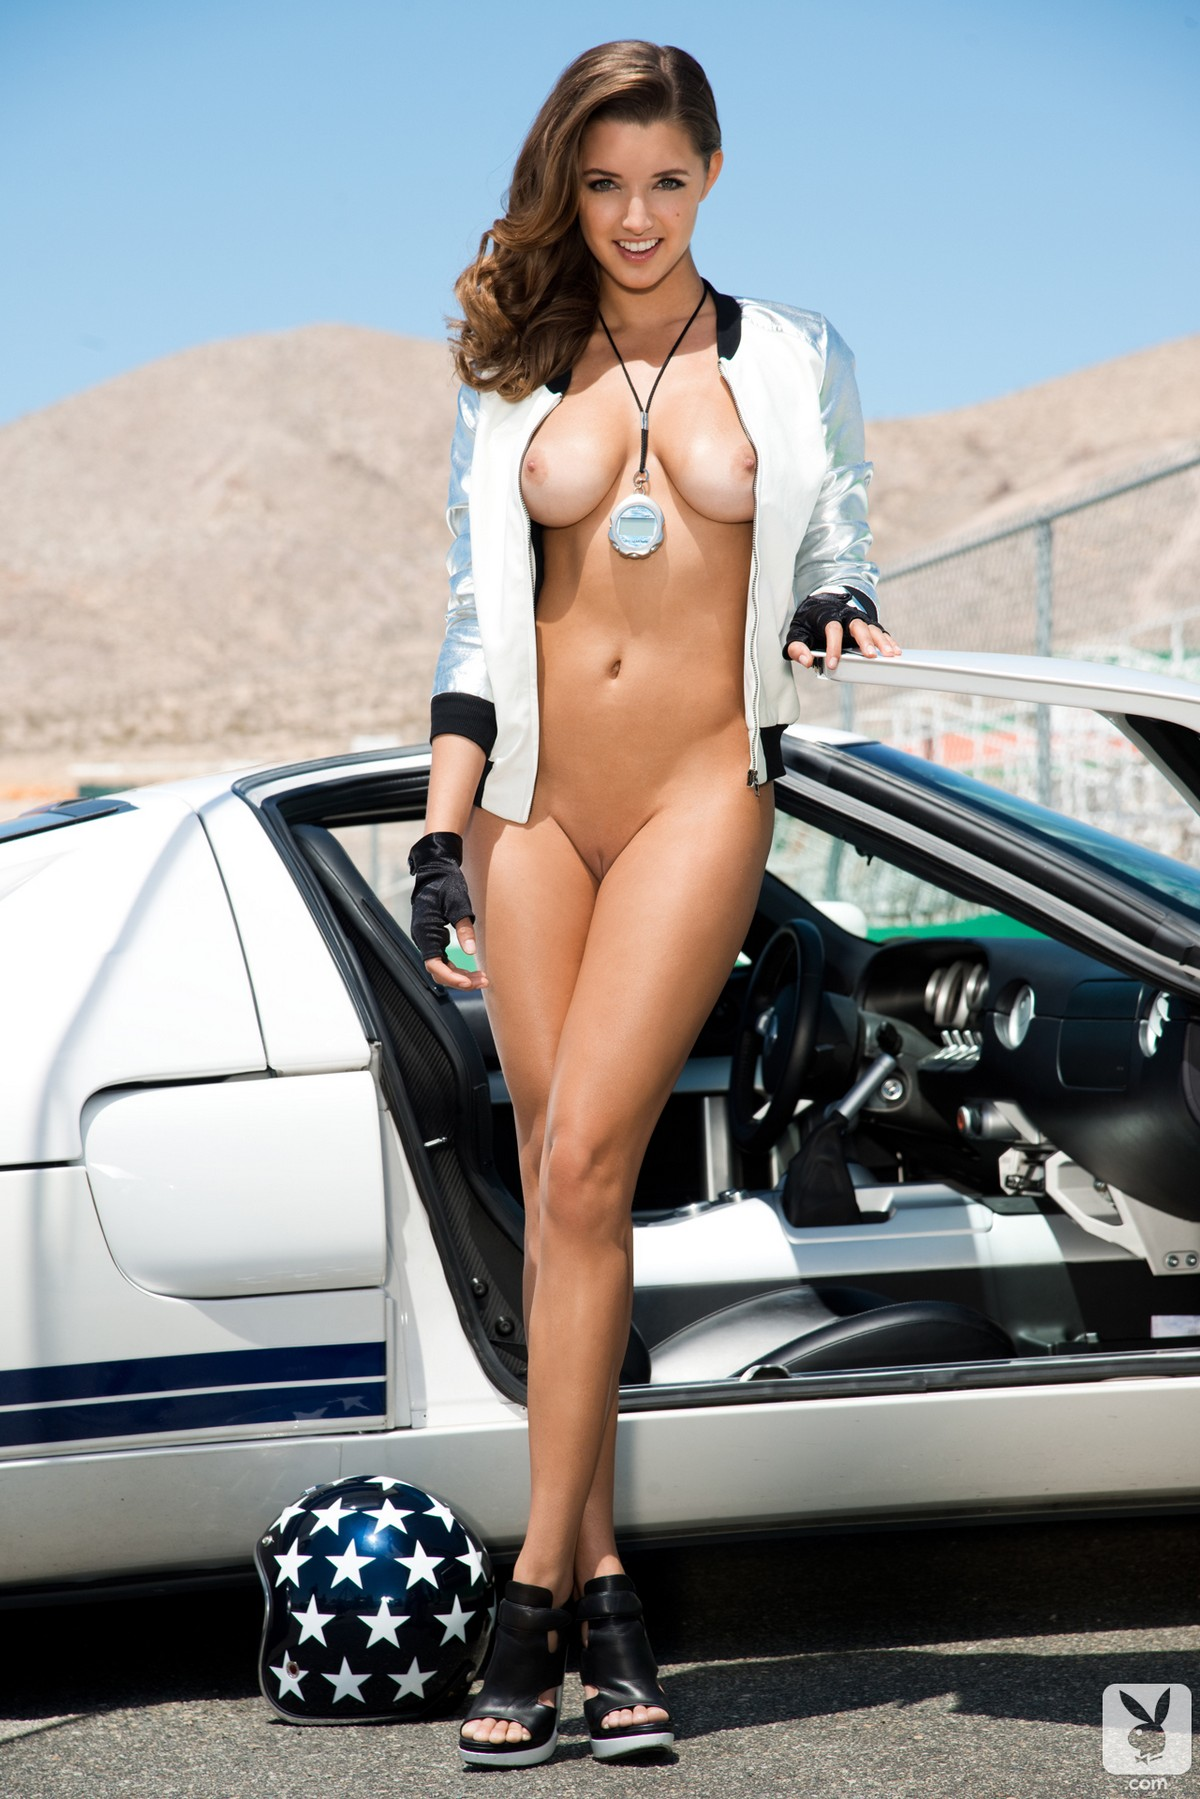 alyssa arce for playboy - picture 12 - exgirlfriend market - the